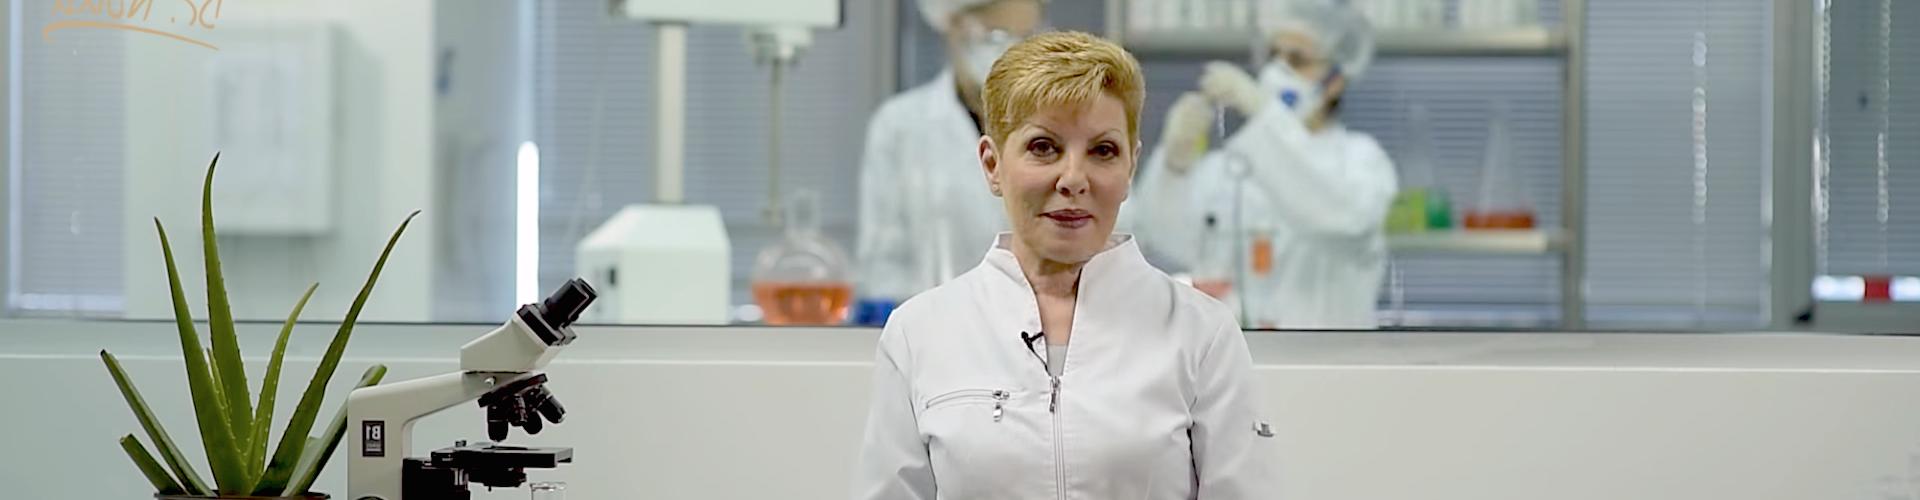 Dr. Nona Kuchina predstavuje Halo produkciu [RUS]